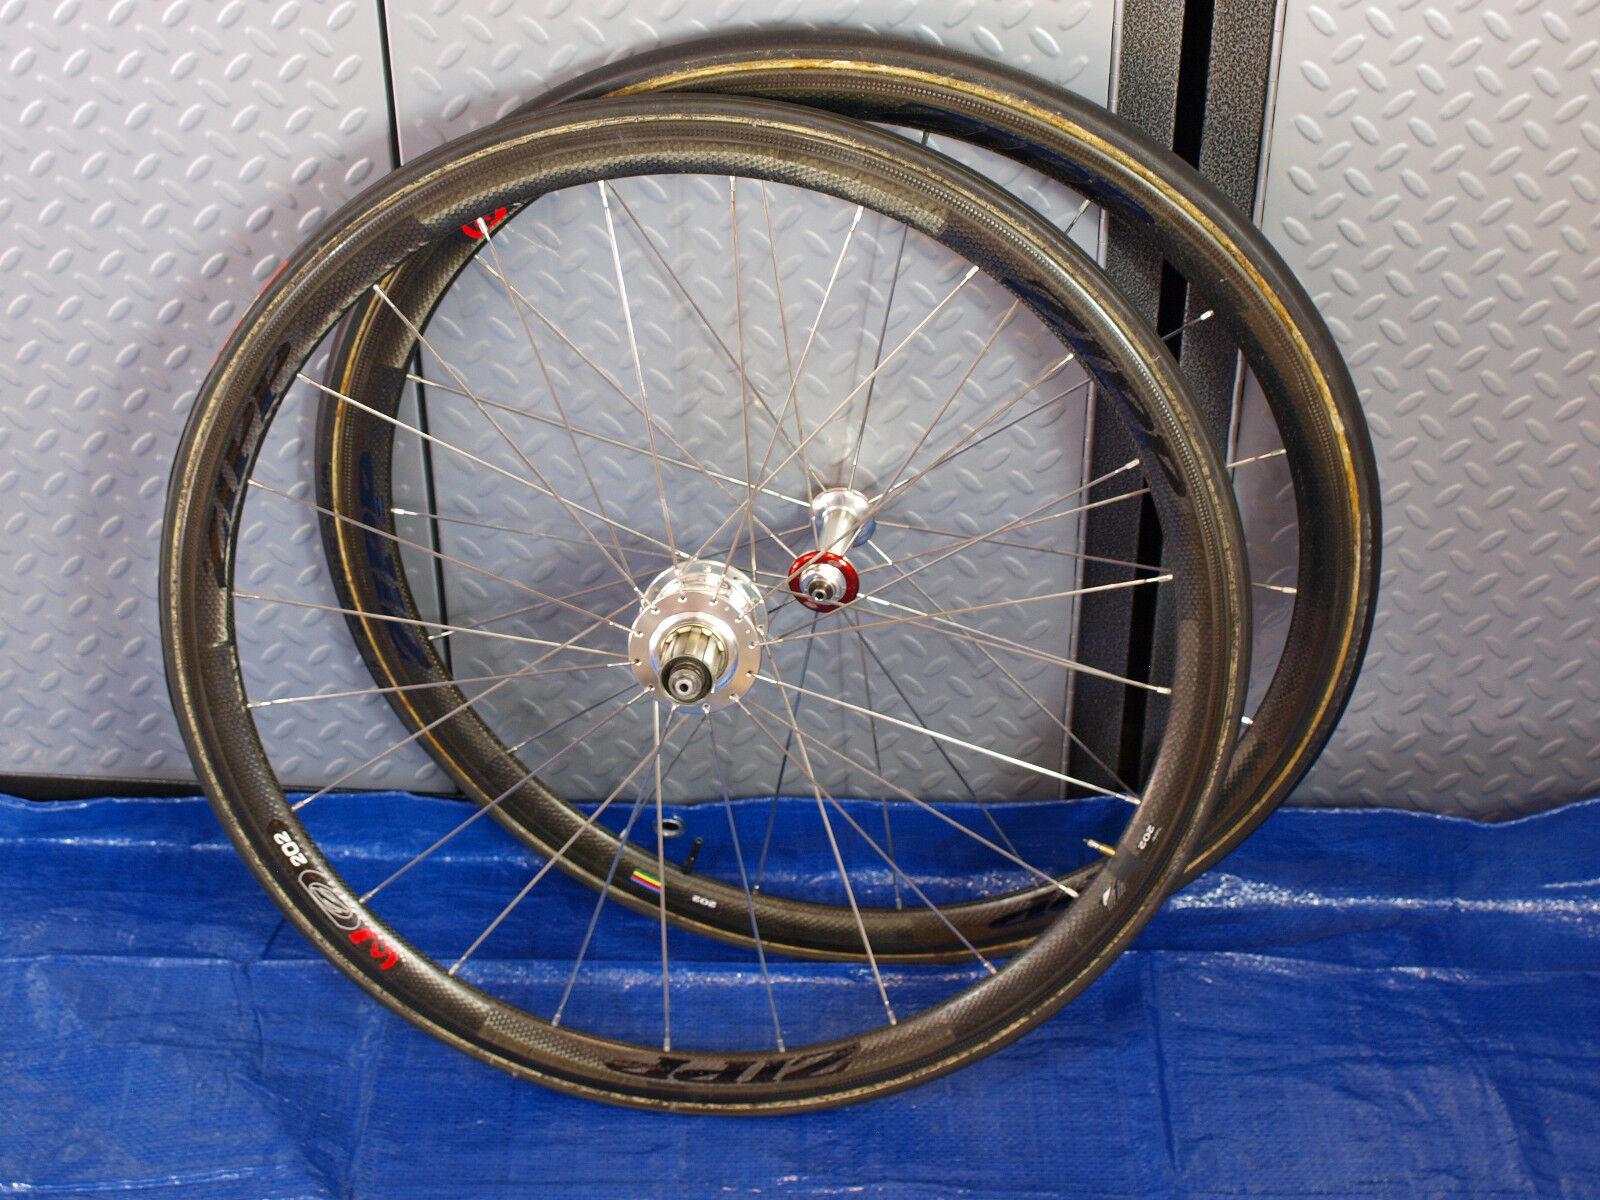 Zipp 202 Firecrest Carbon Tubular Wheelset 700c 10 11 Spd. W CycleOps Powertap